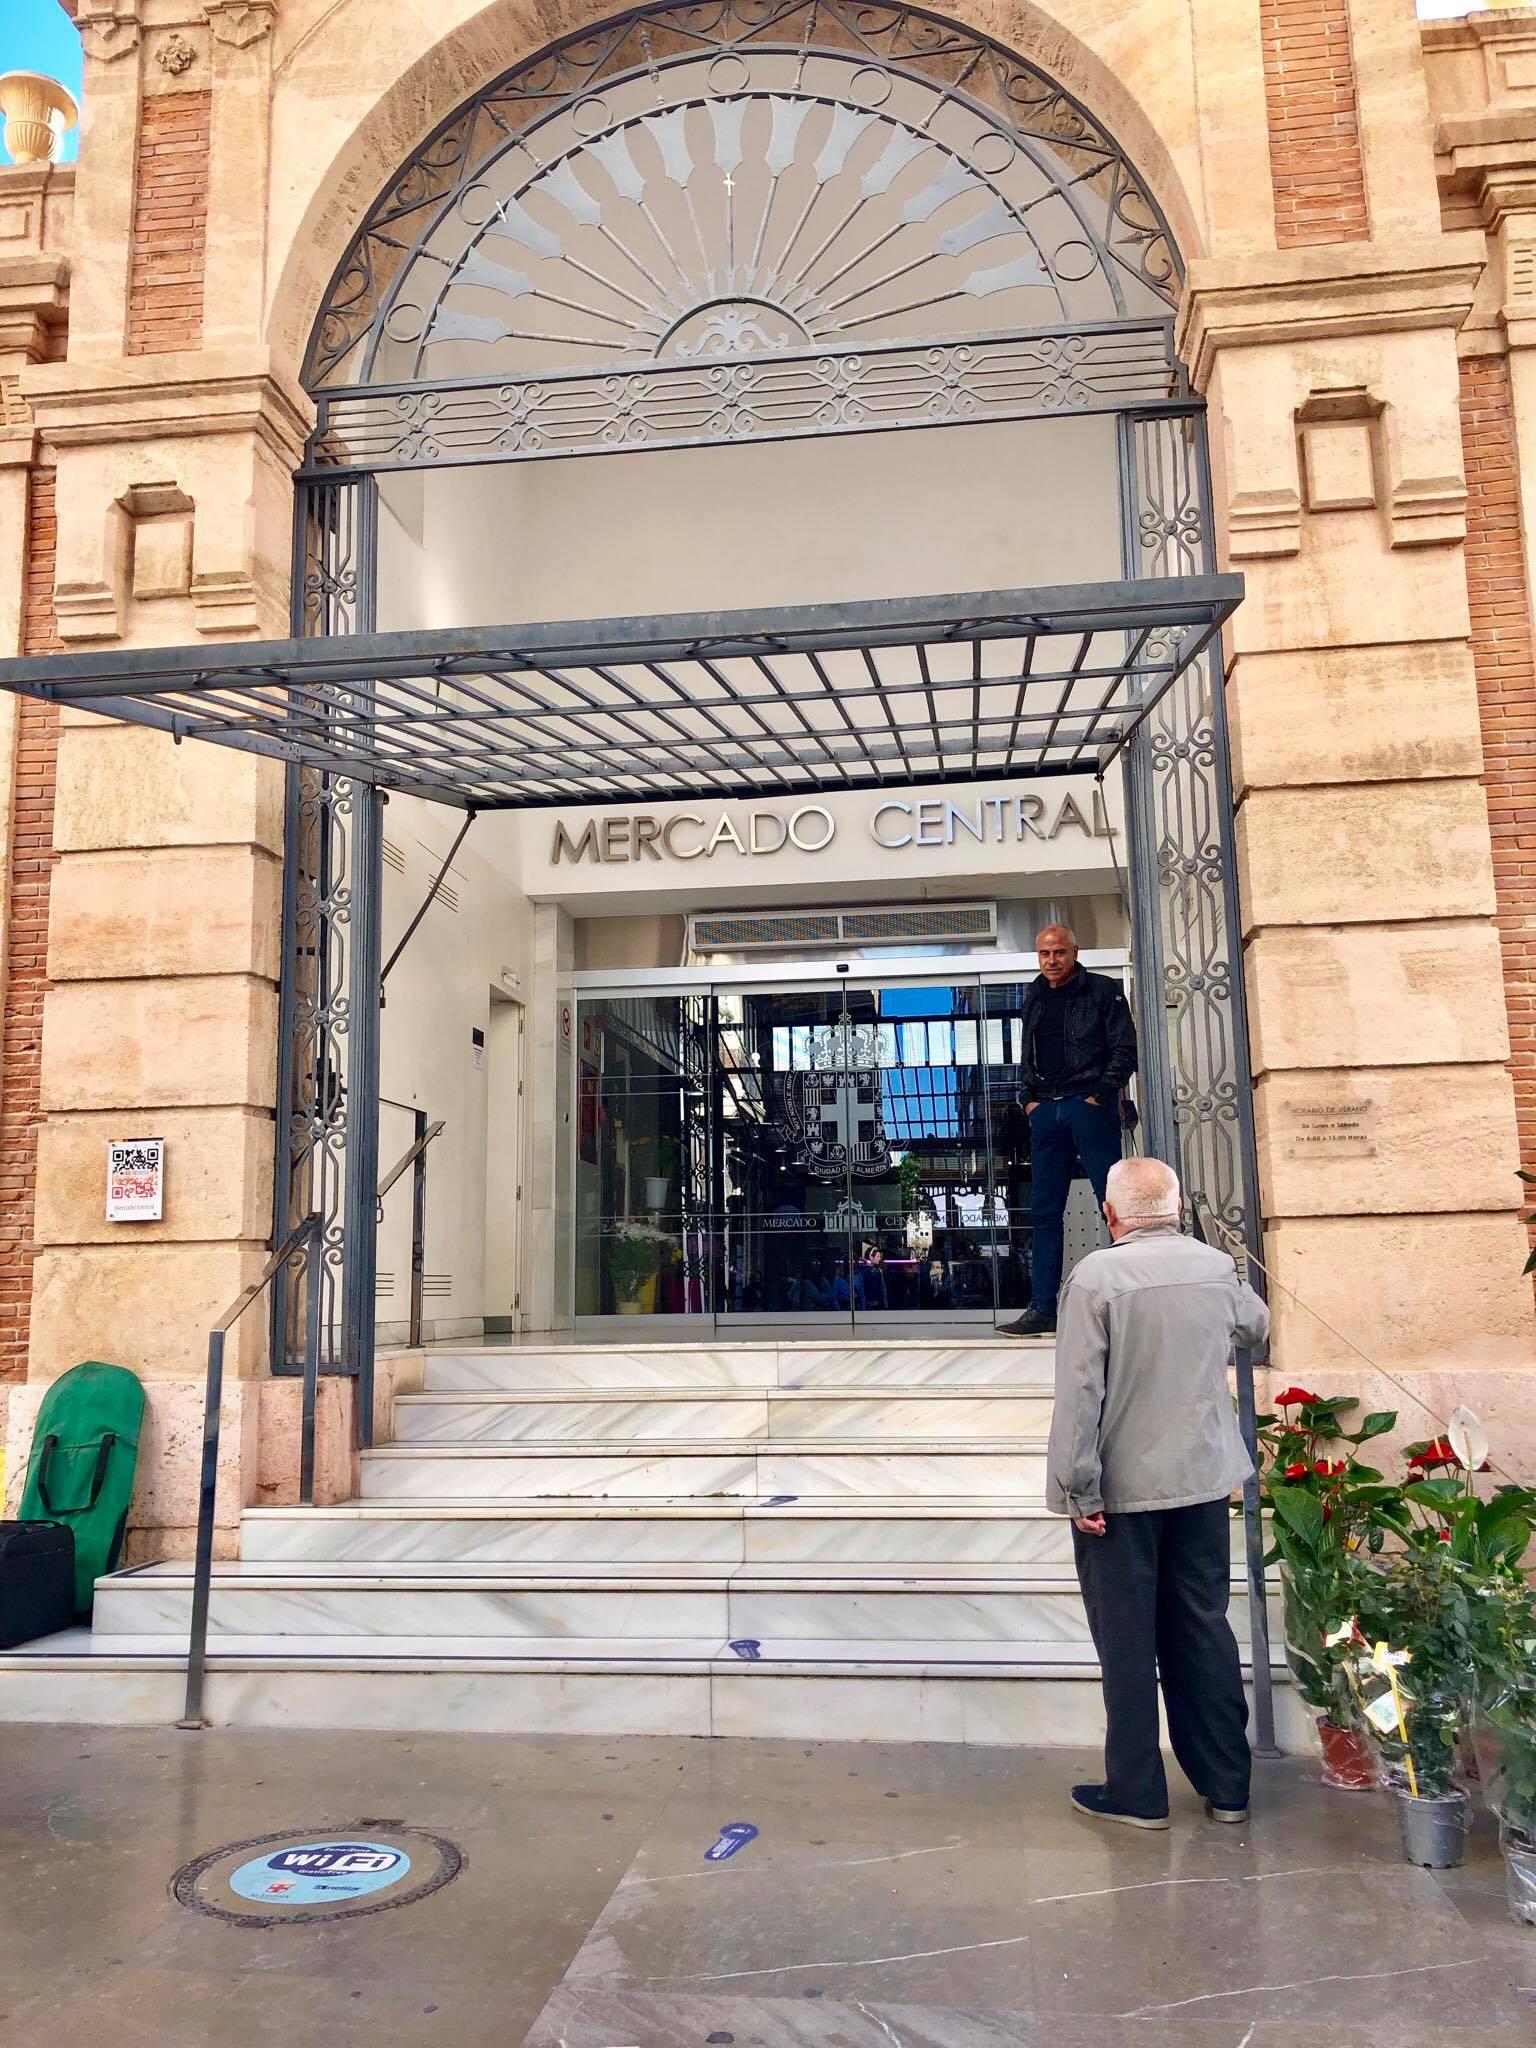 Kach Solo Travels in 2019 Thanks to Cámara de Comercio de Almería1.jpg